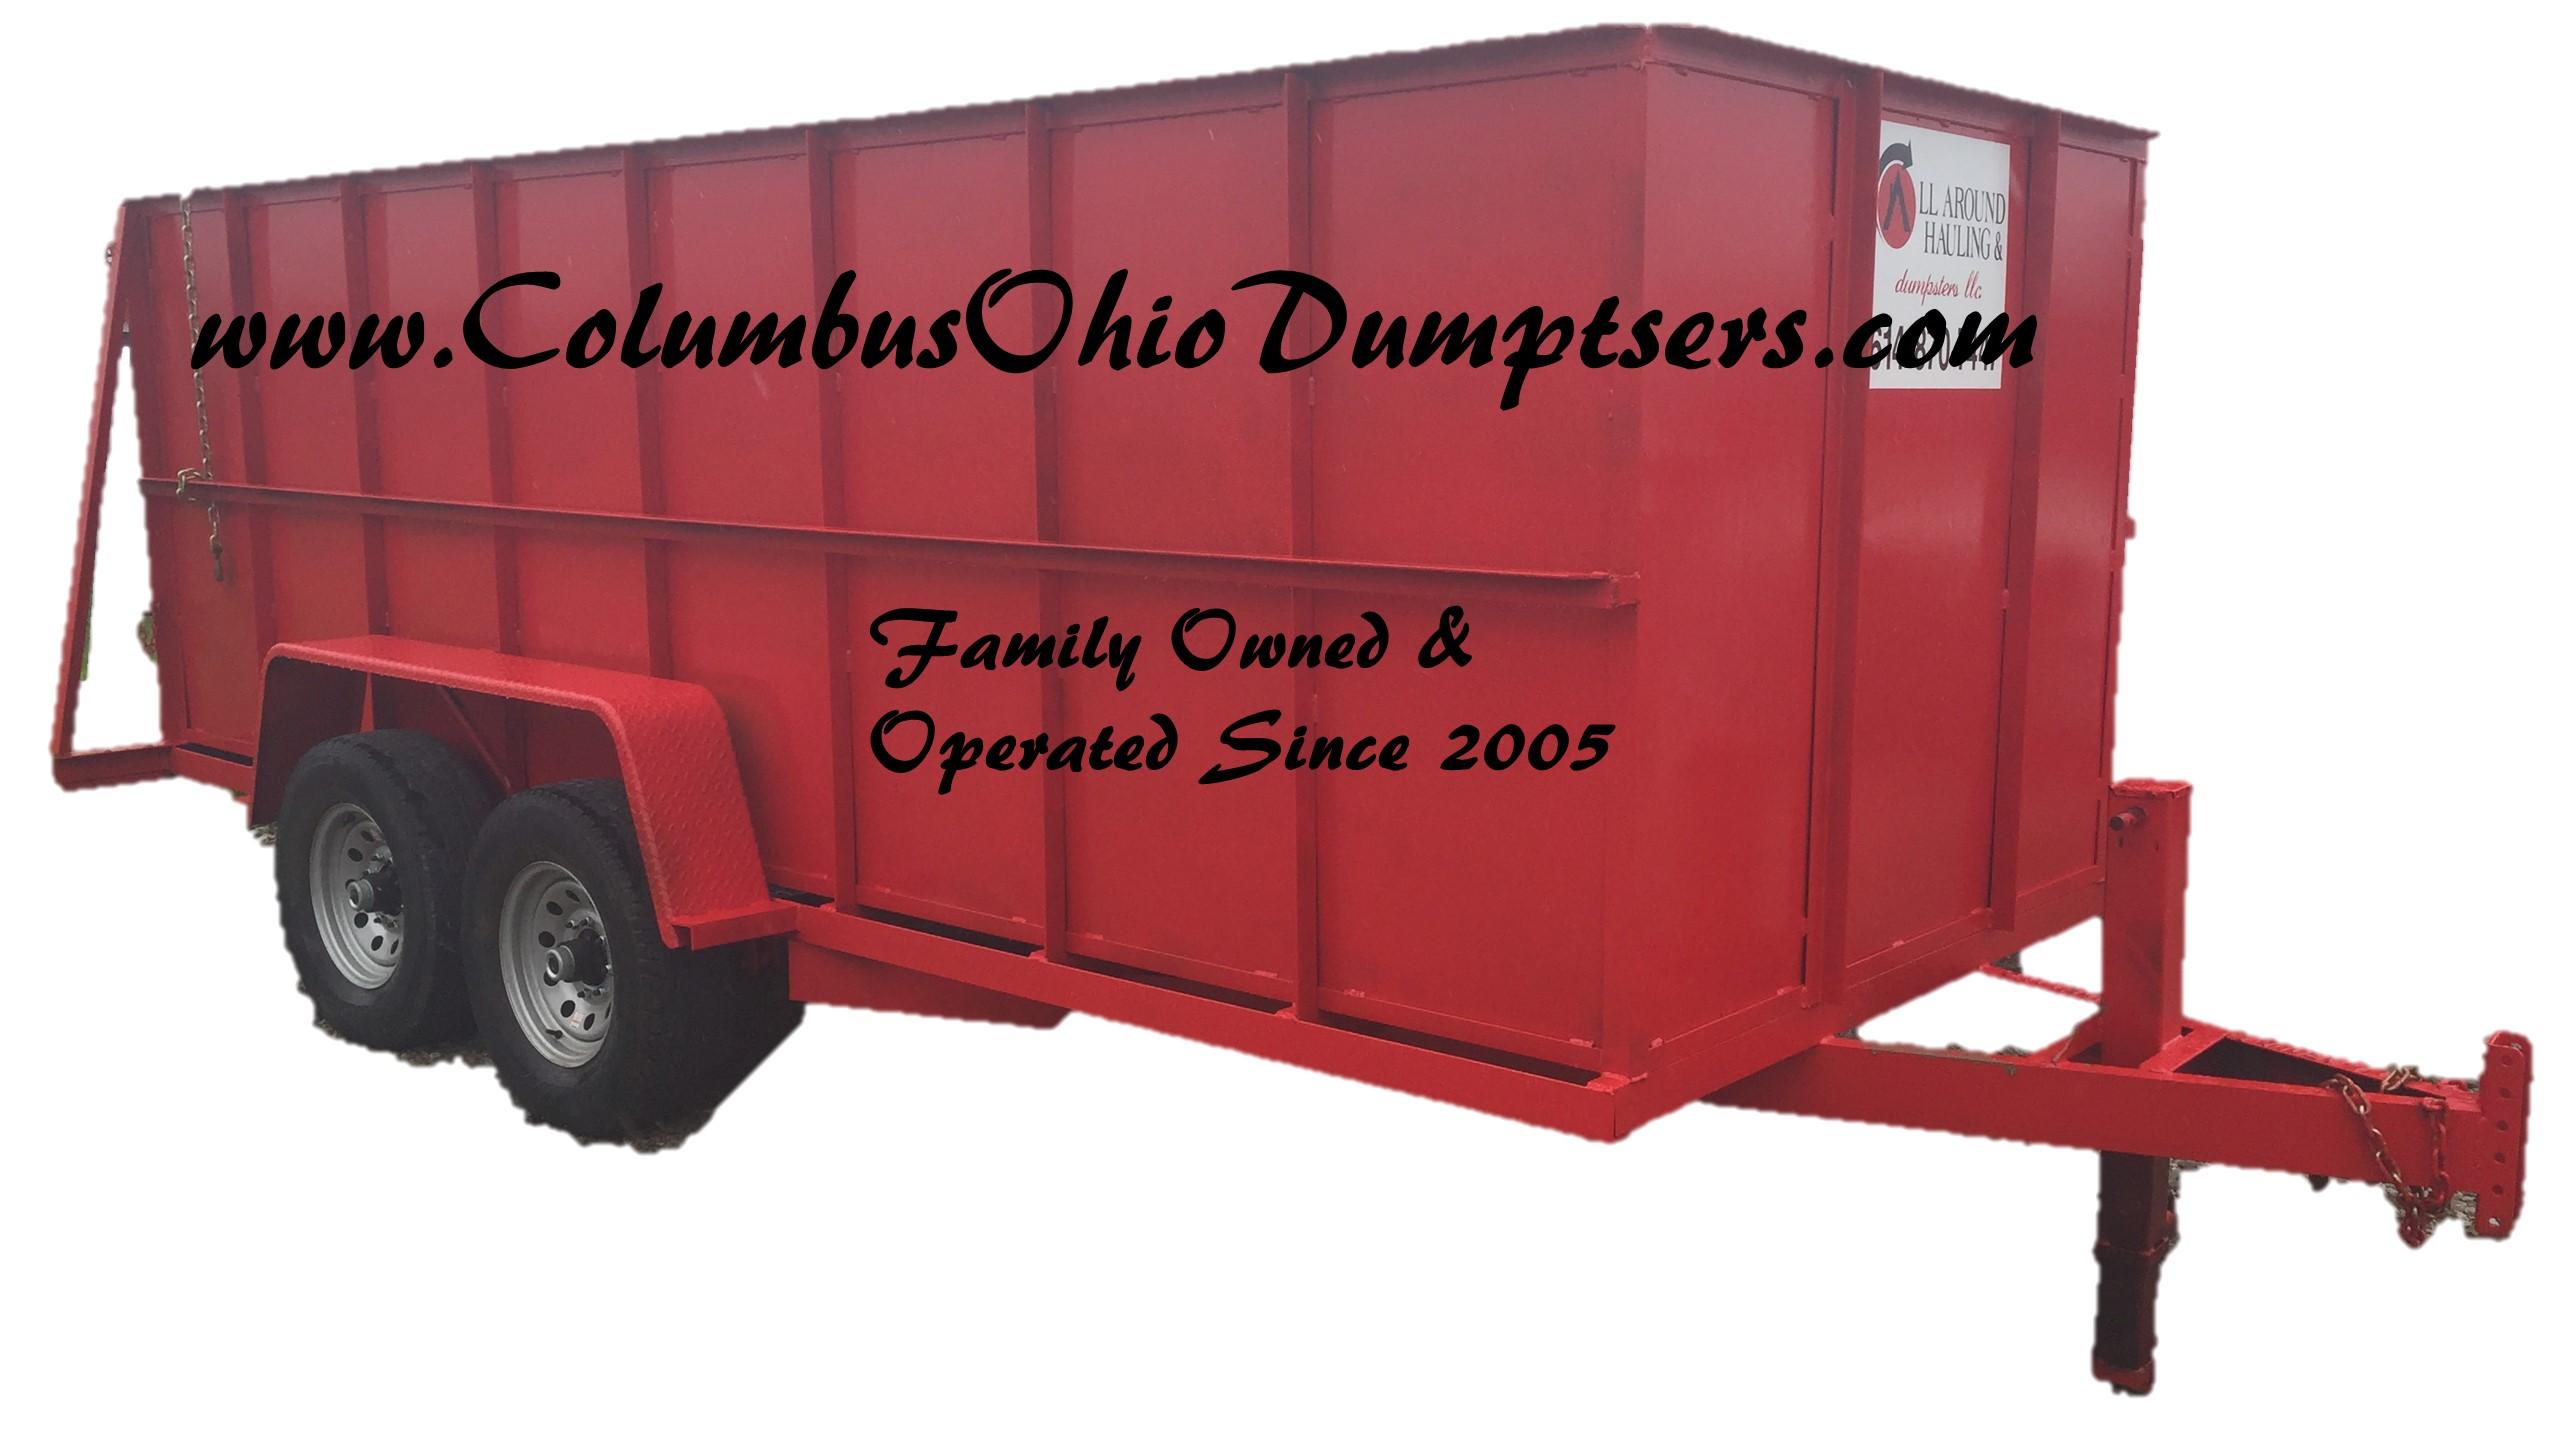 Rent-A-Dumpster LLC. image 2